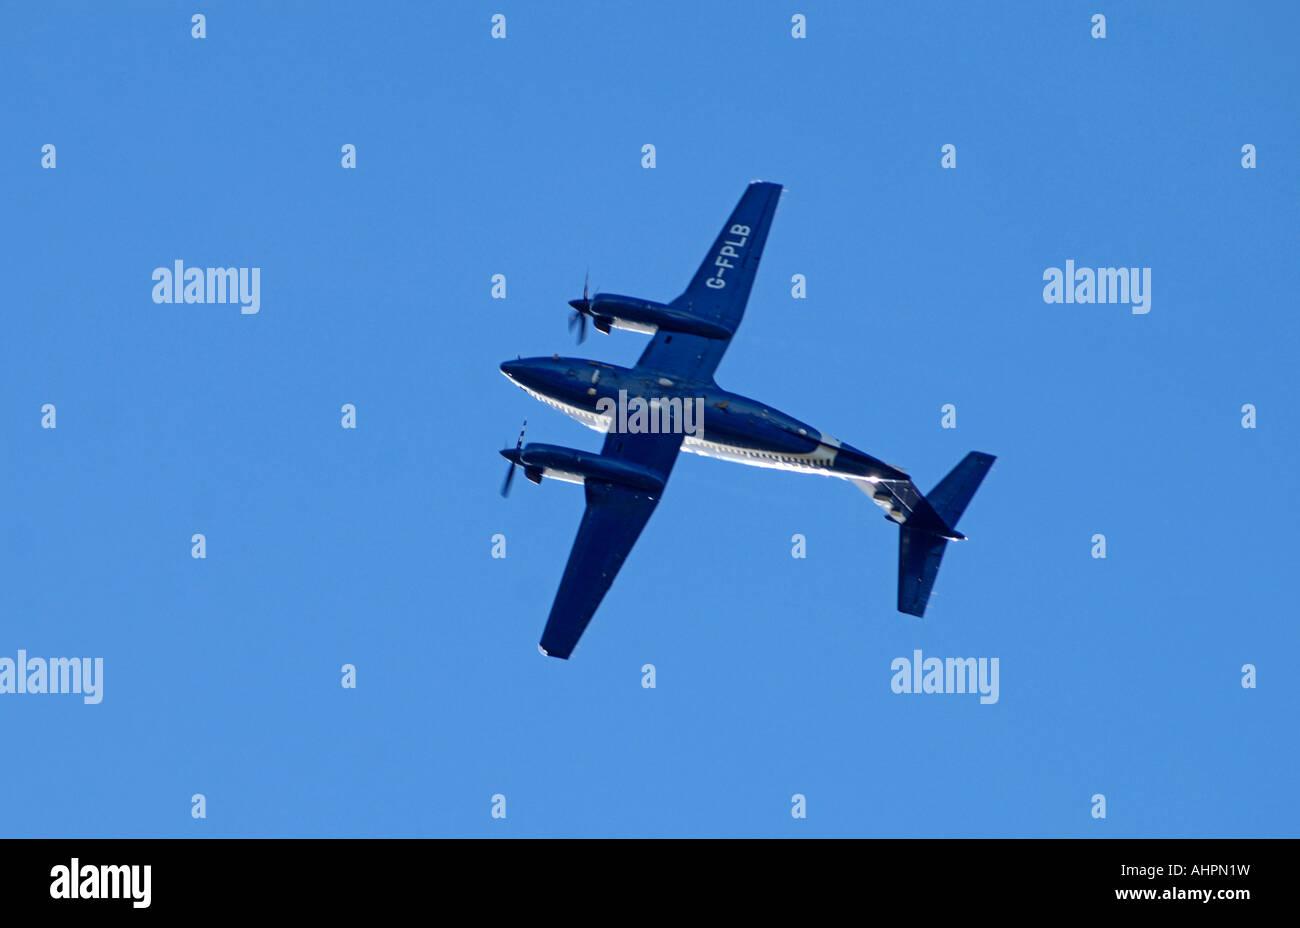 Flight Precision Ltd Beech Super King Air B200 G-FPLB Working on airfield runway calibration - Stock Image